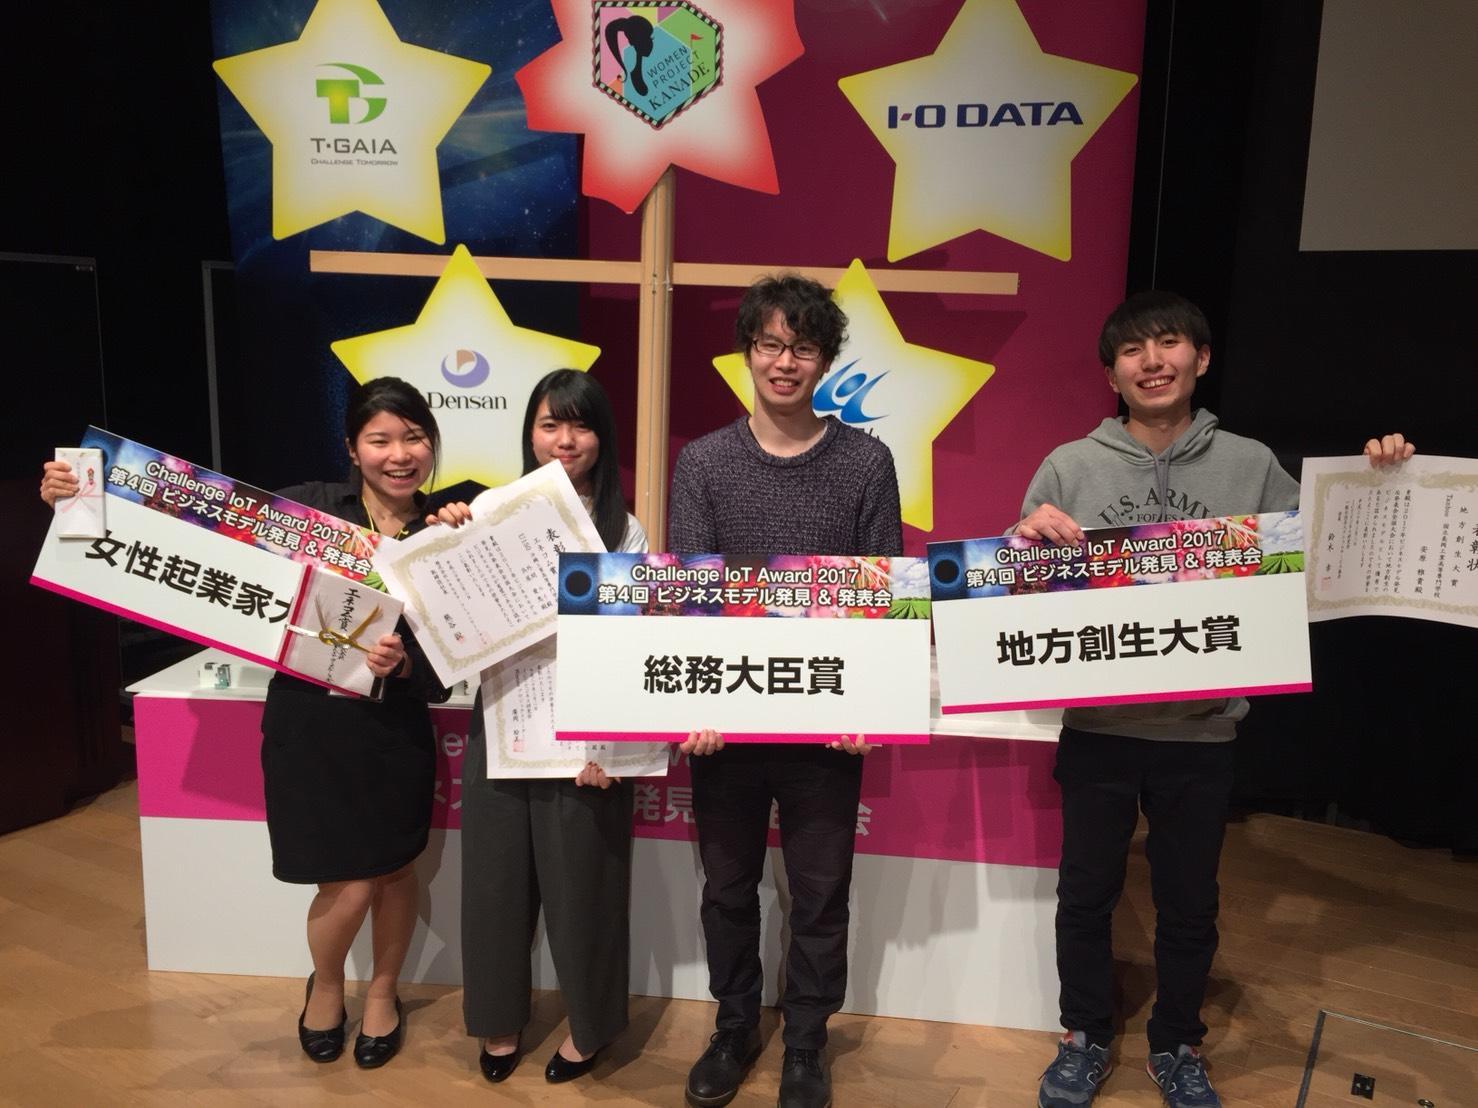 Challenge IoT Award 全国大会 総務大臣賞 受賞【広島大学 起業部 1st Penguin Club 】